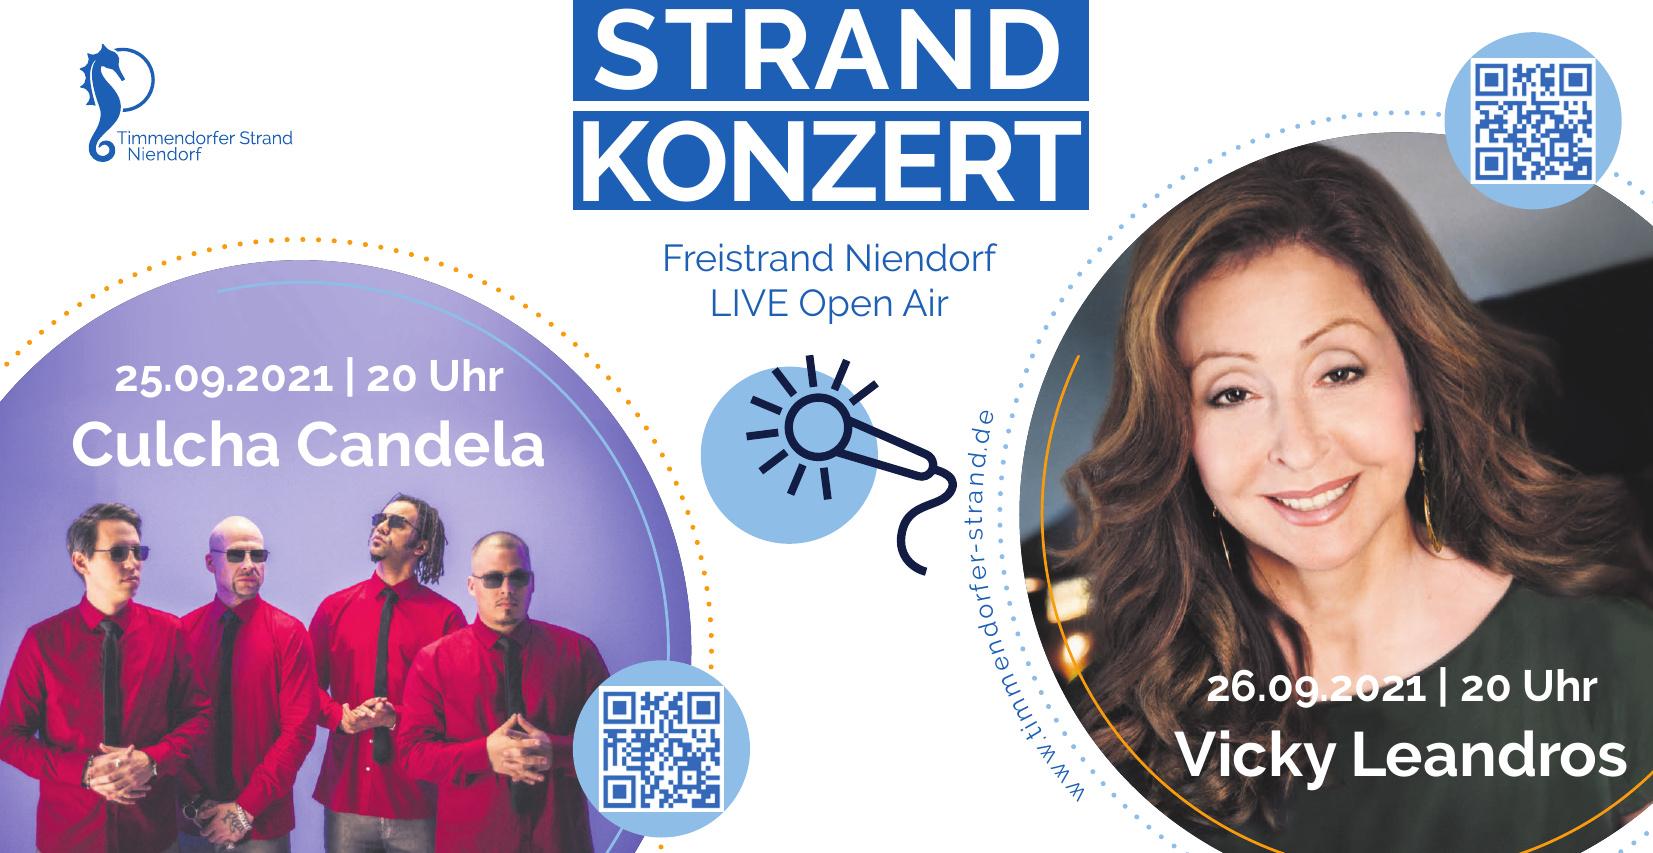 Timmendorfer Strand Niendorf - Strand Konzert